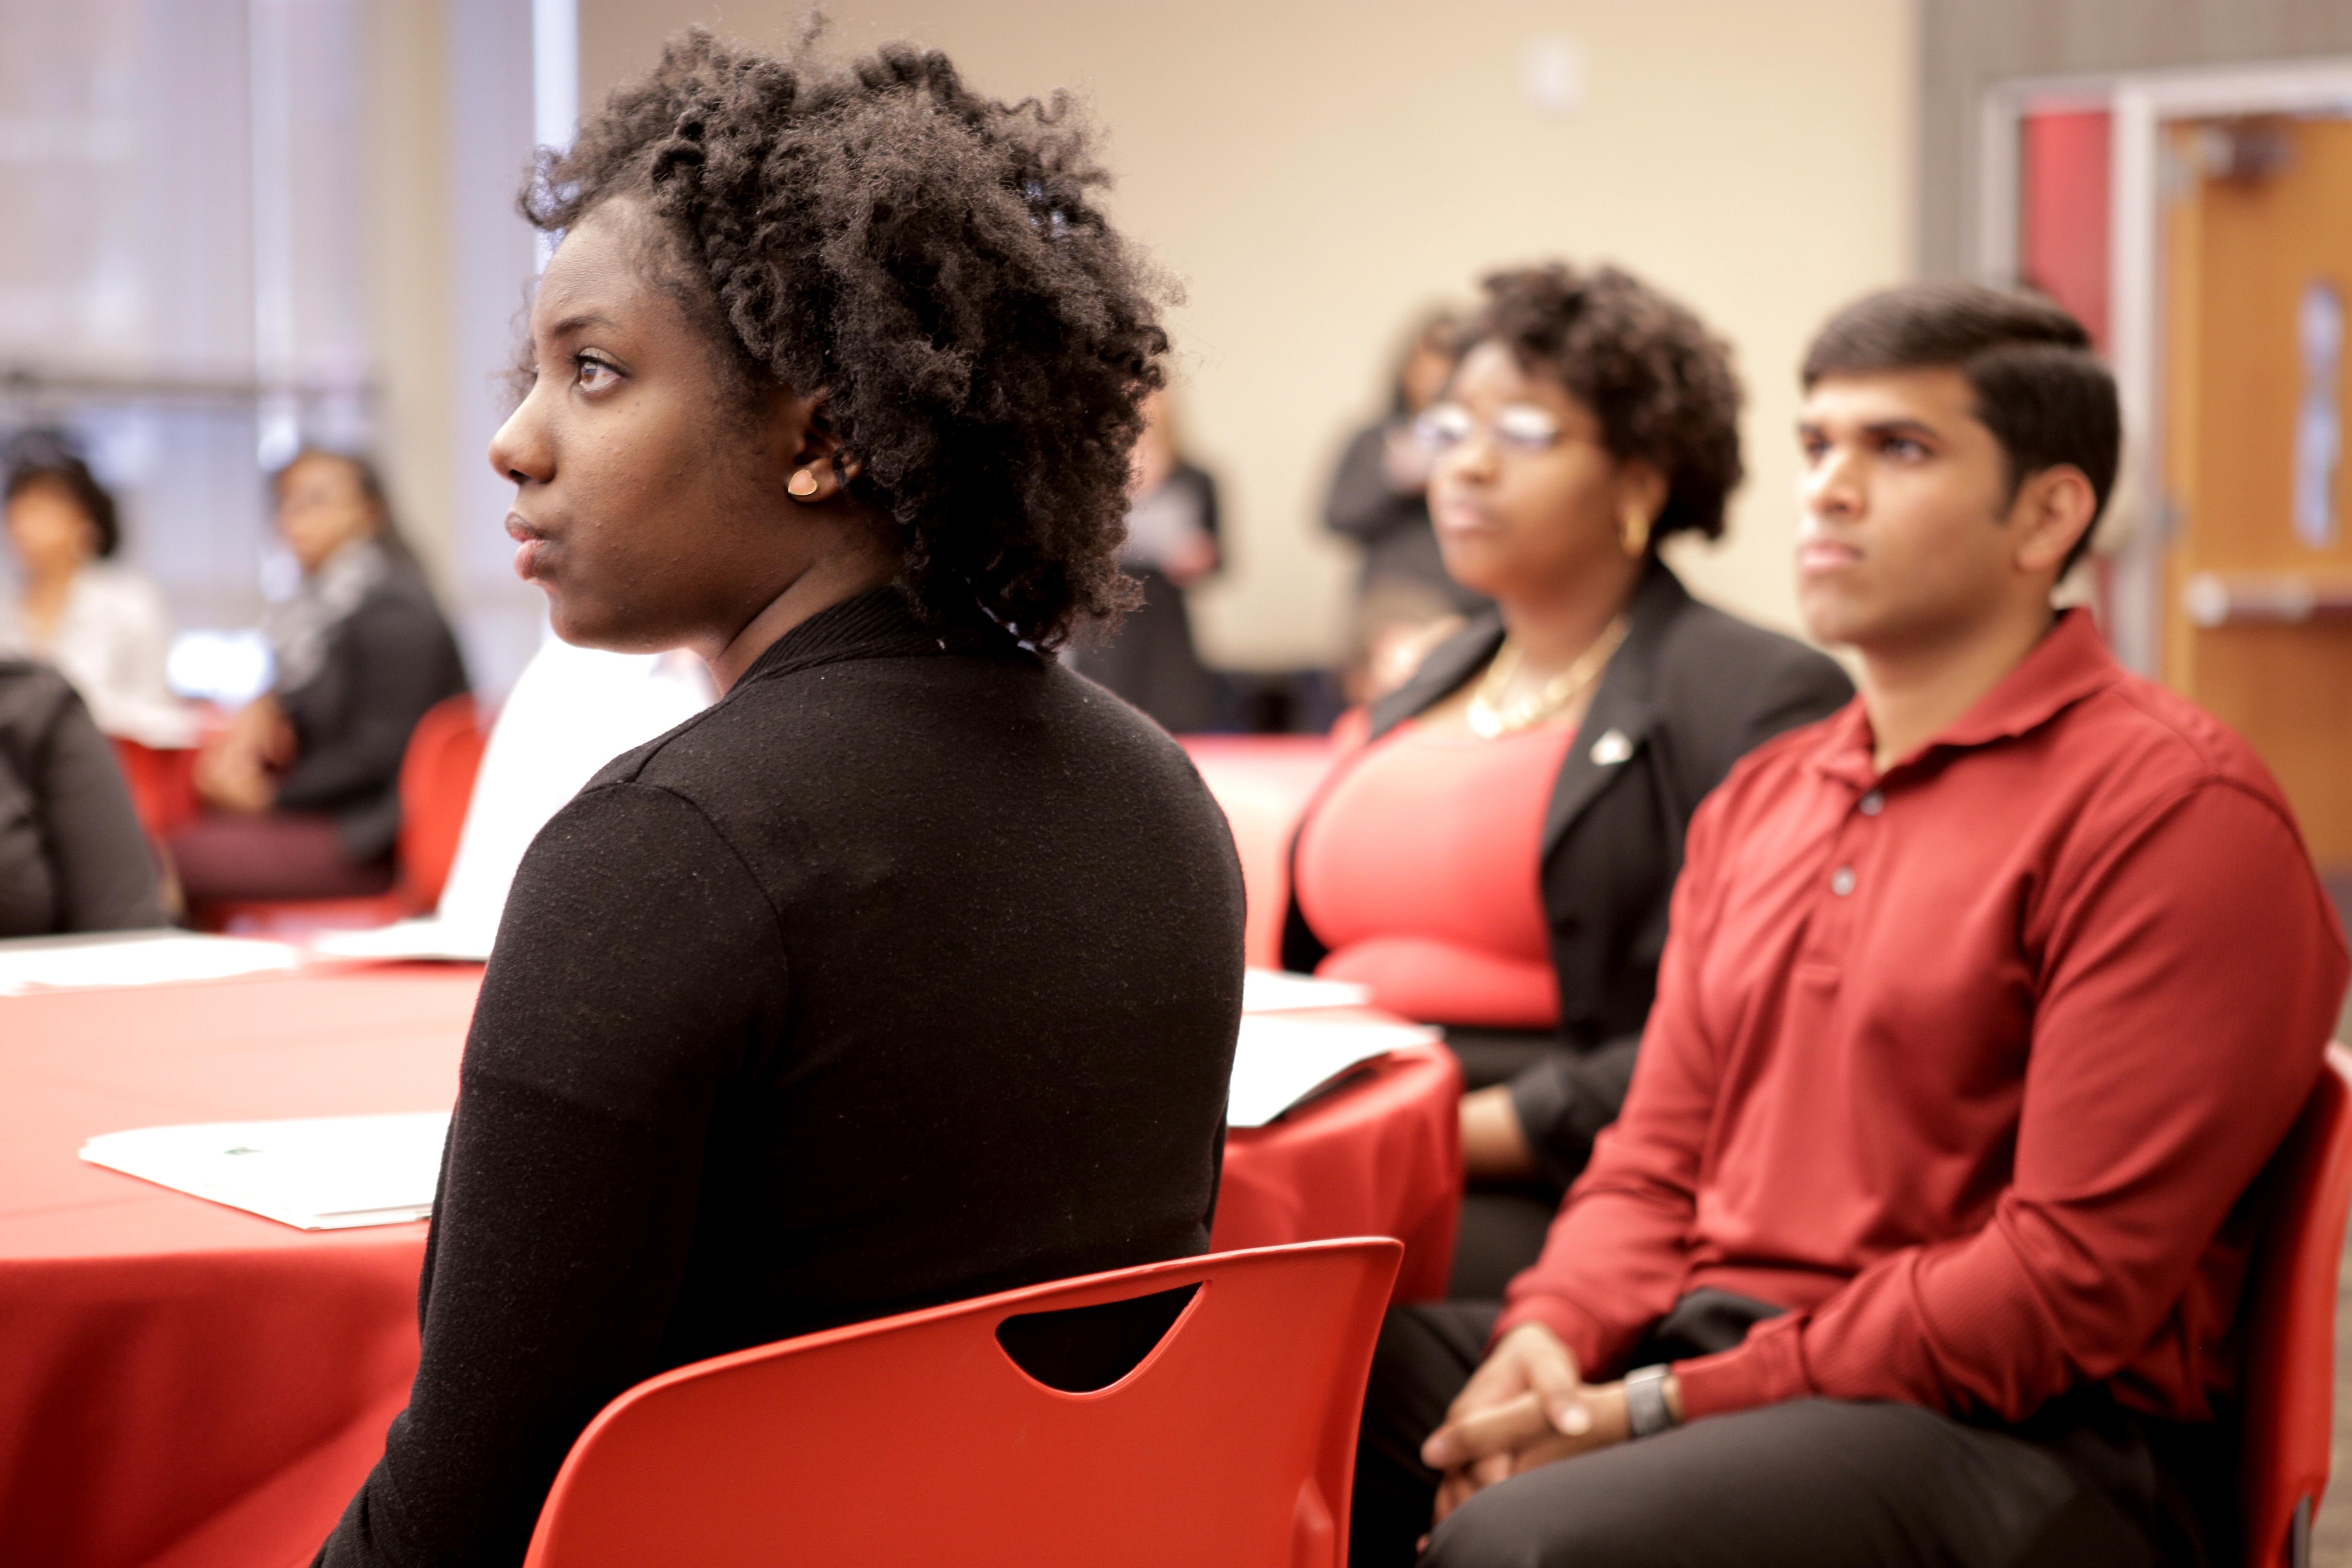 Can minority students change medicine's racial imbalance?